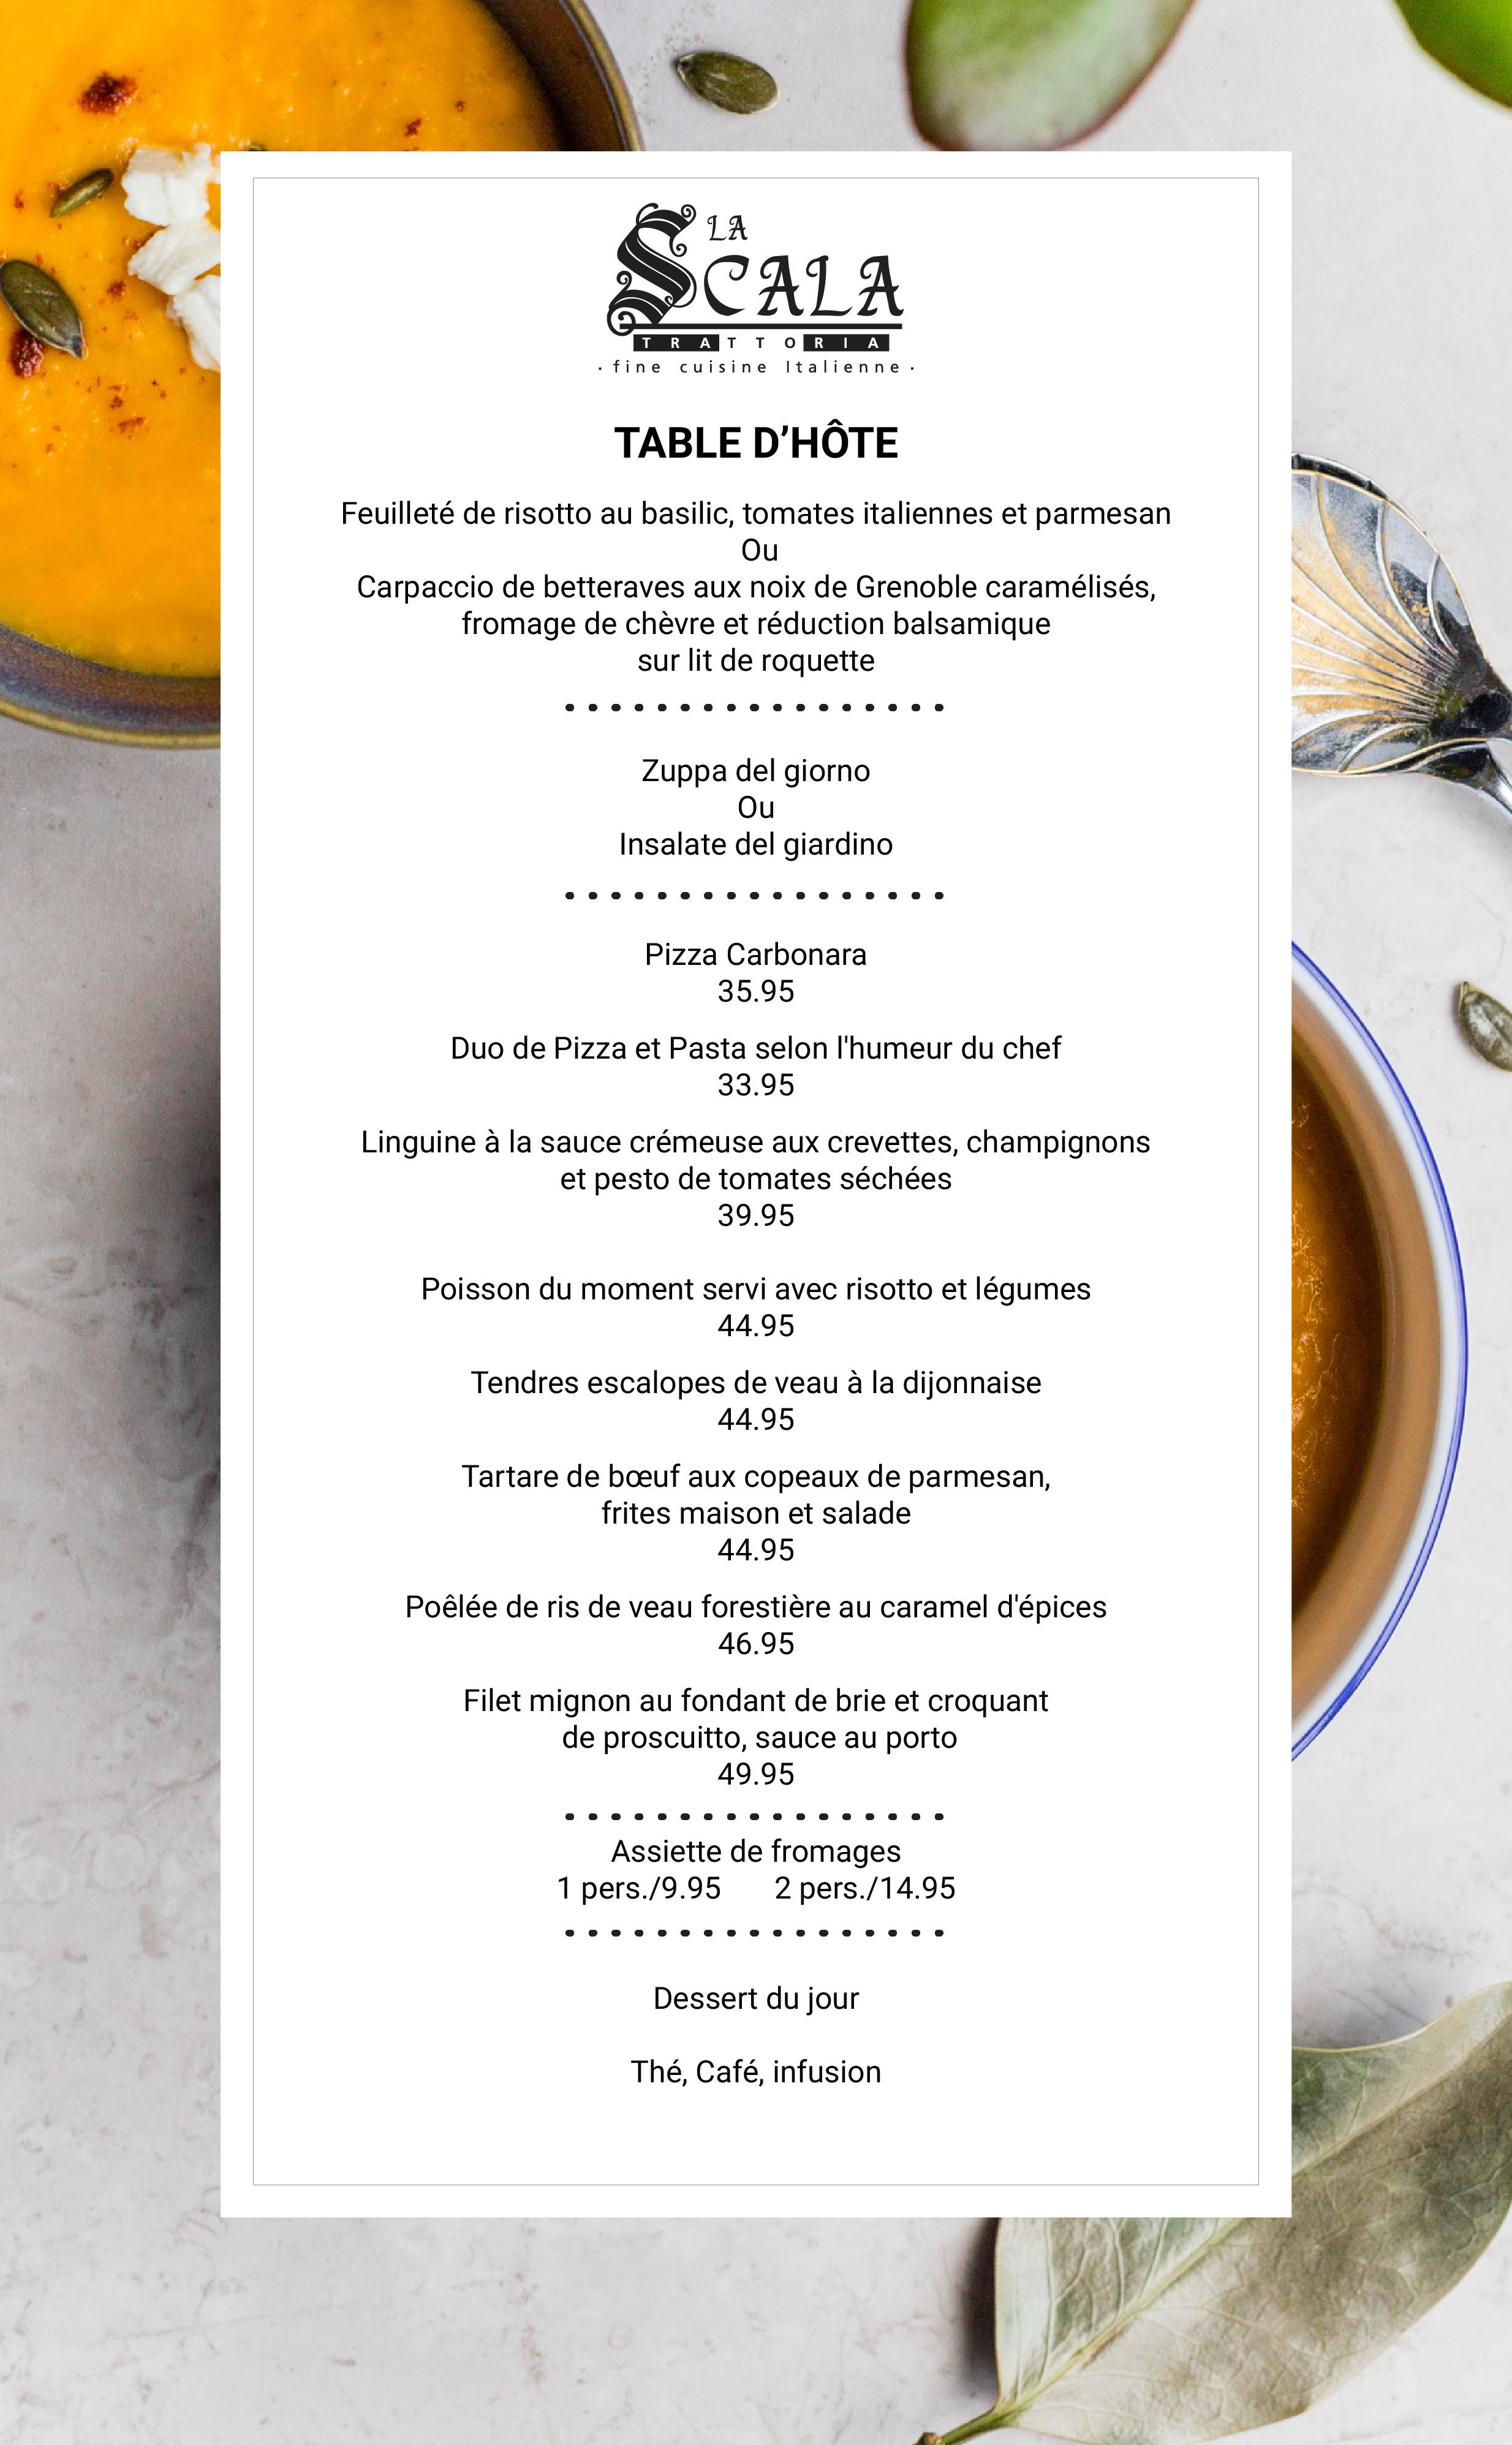 Table d'hôte Resto La Scala